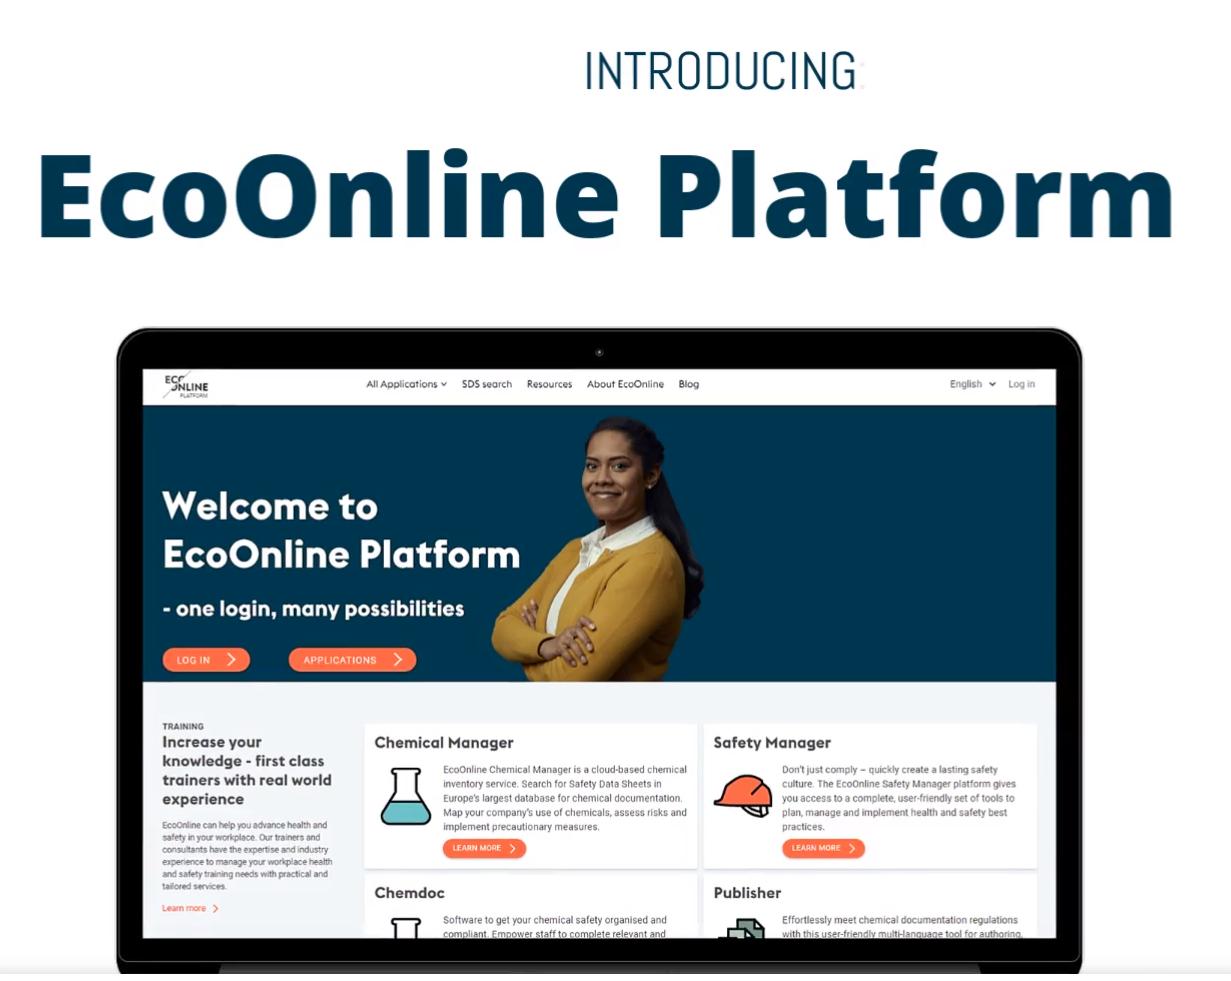 EcoOnline Platform screenshot: EcoOnline Platform